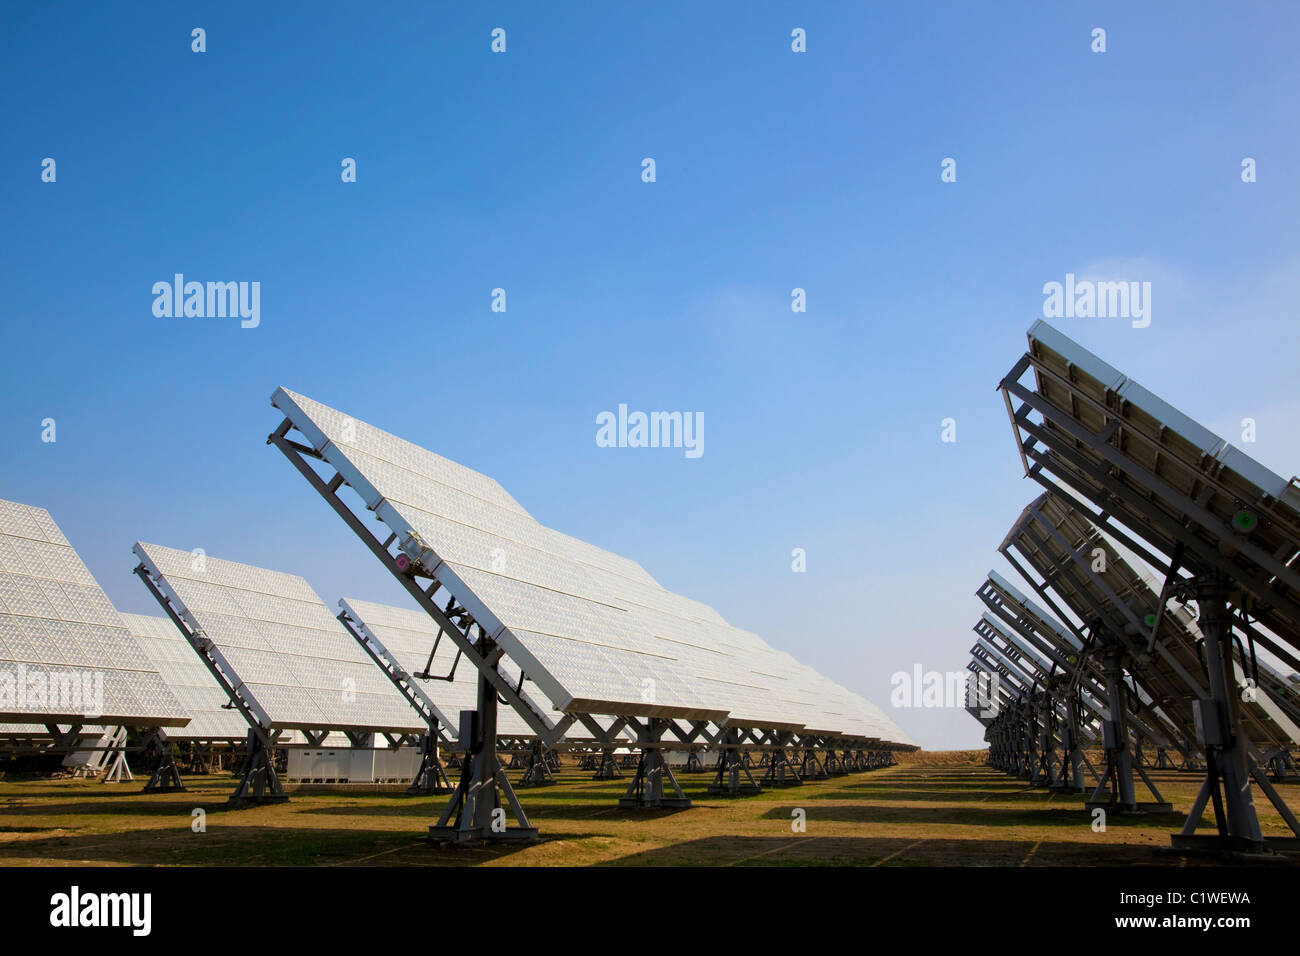 Un campo de paneles solares fotovoltaicos proporcionan energía verde Imagen De Stock